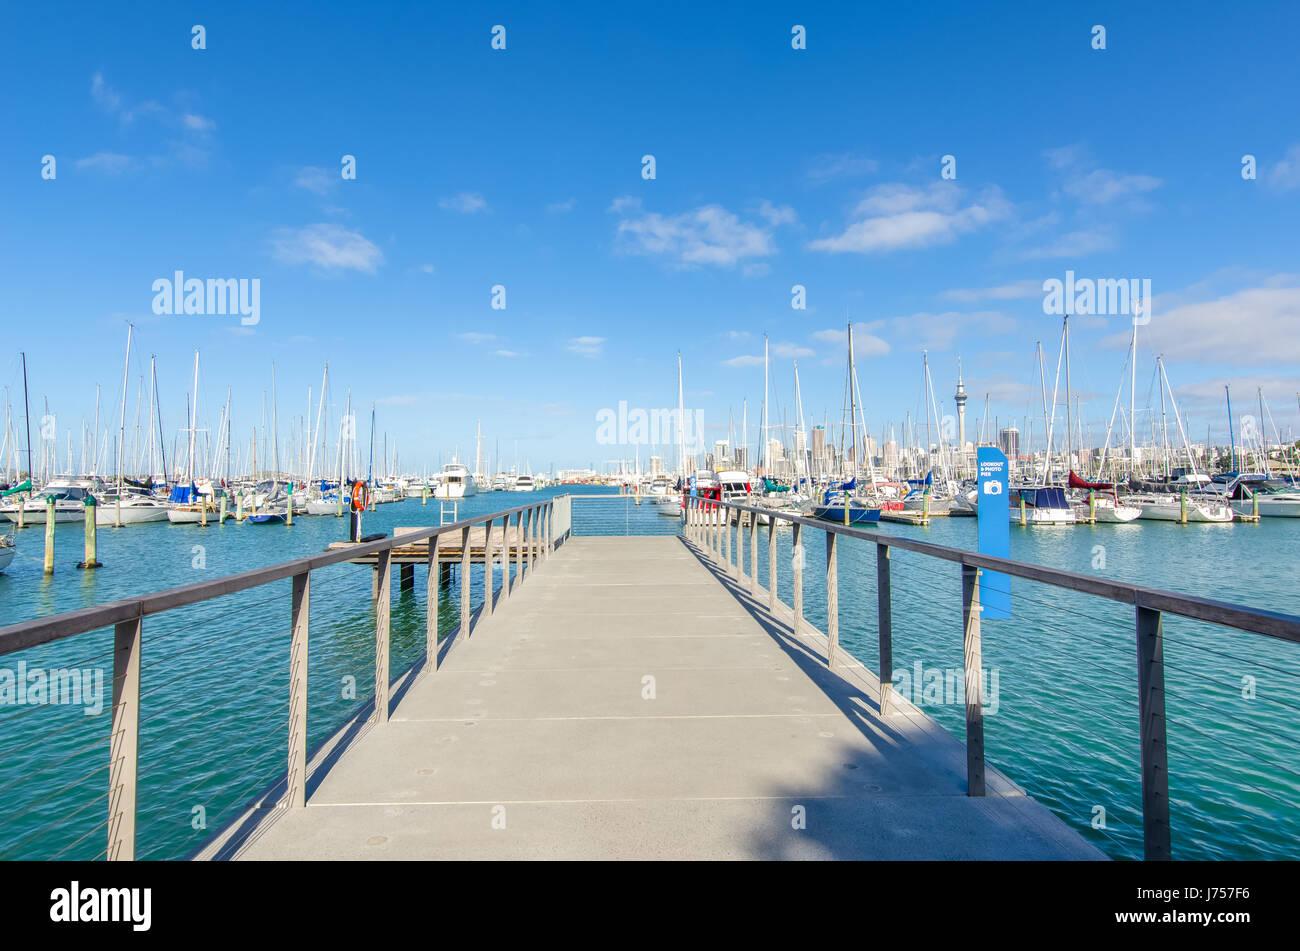 Auckland,New Zealand - October 25,2015 : Westhaven Marina is the largest yacht marina in Auckland,New Zealand. - Stock Image